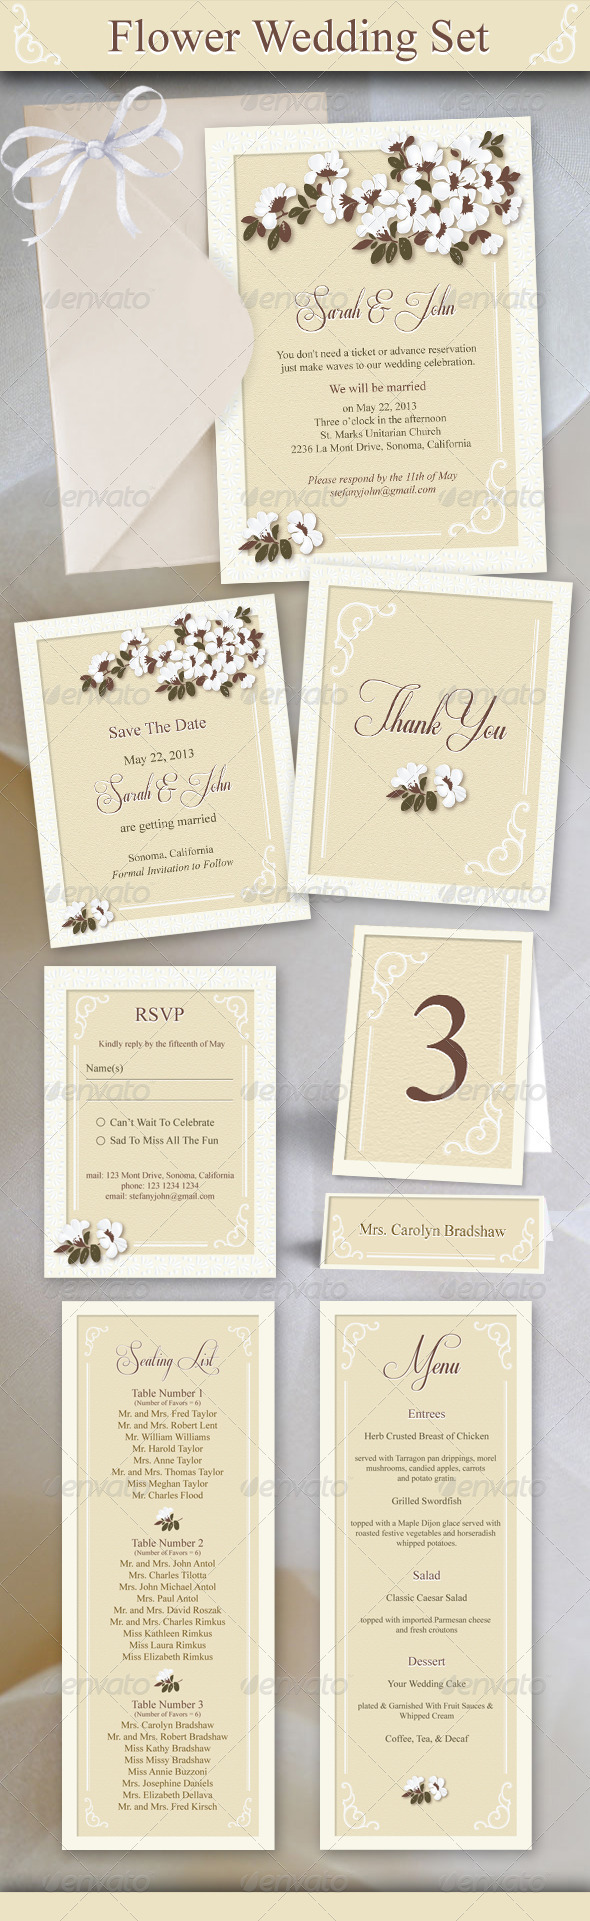 Flower Wedding Set